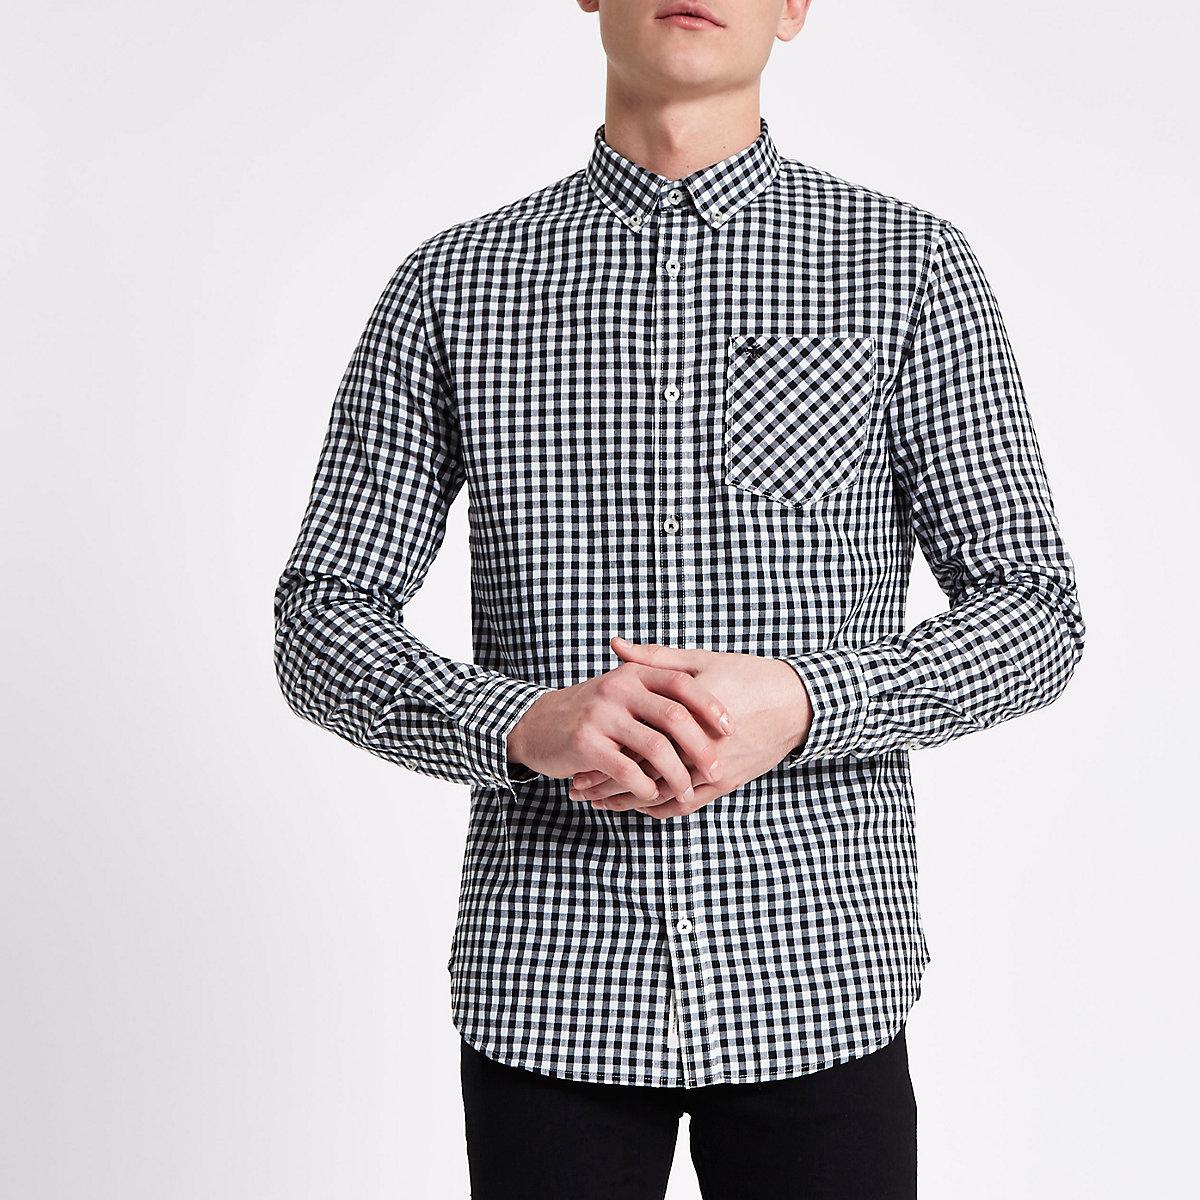 Black gingham button-down shirt